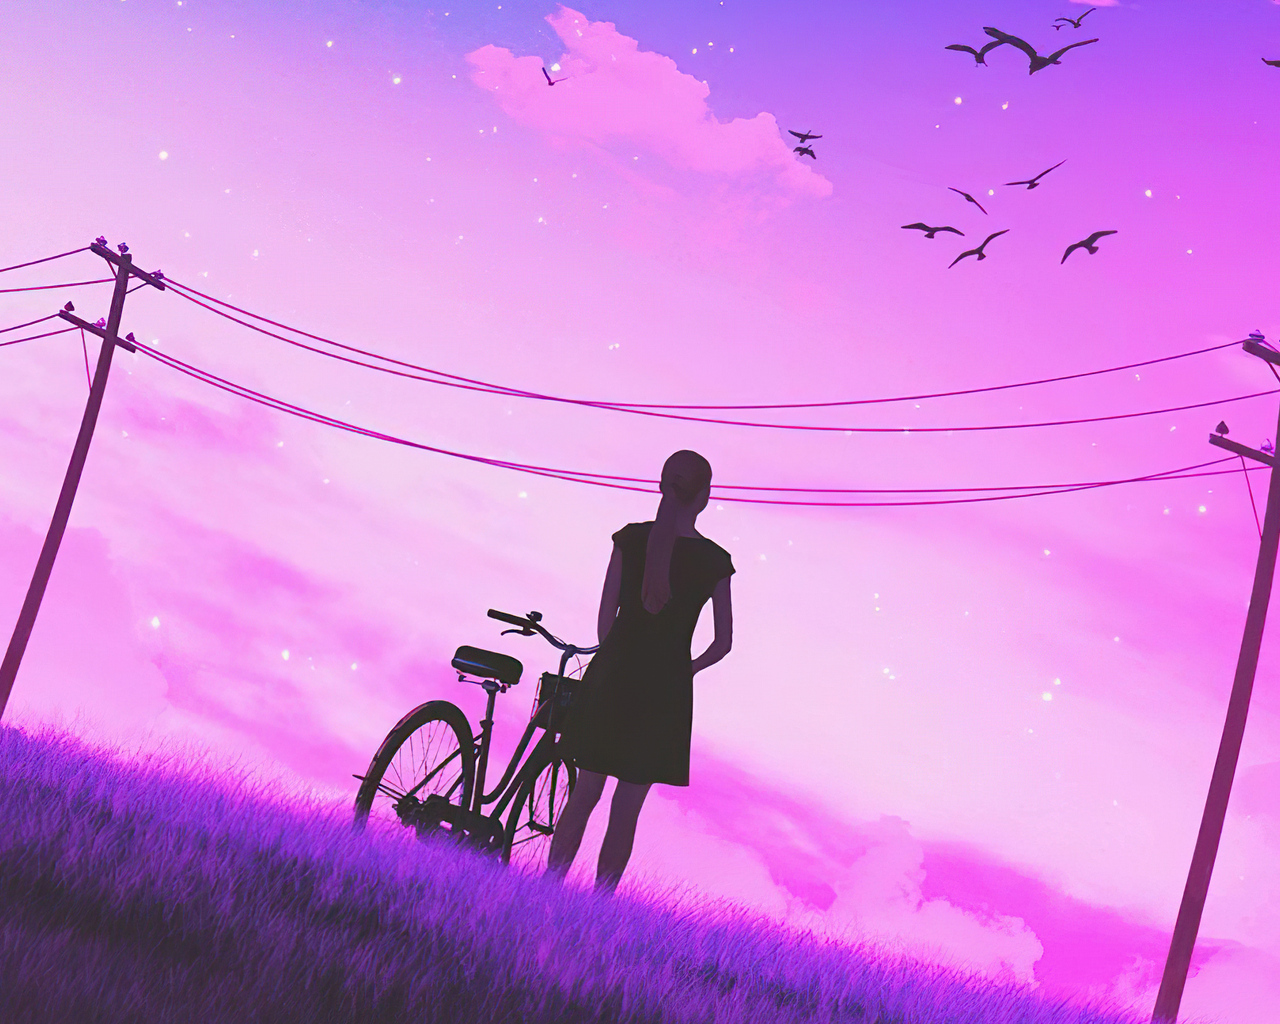 girl-bicycle-vaporwave-art-4k-ha.jpg